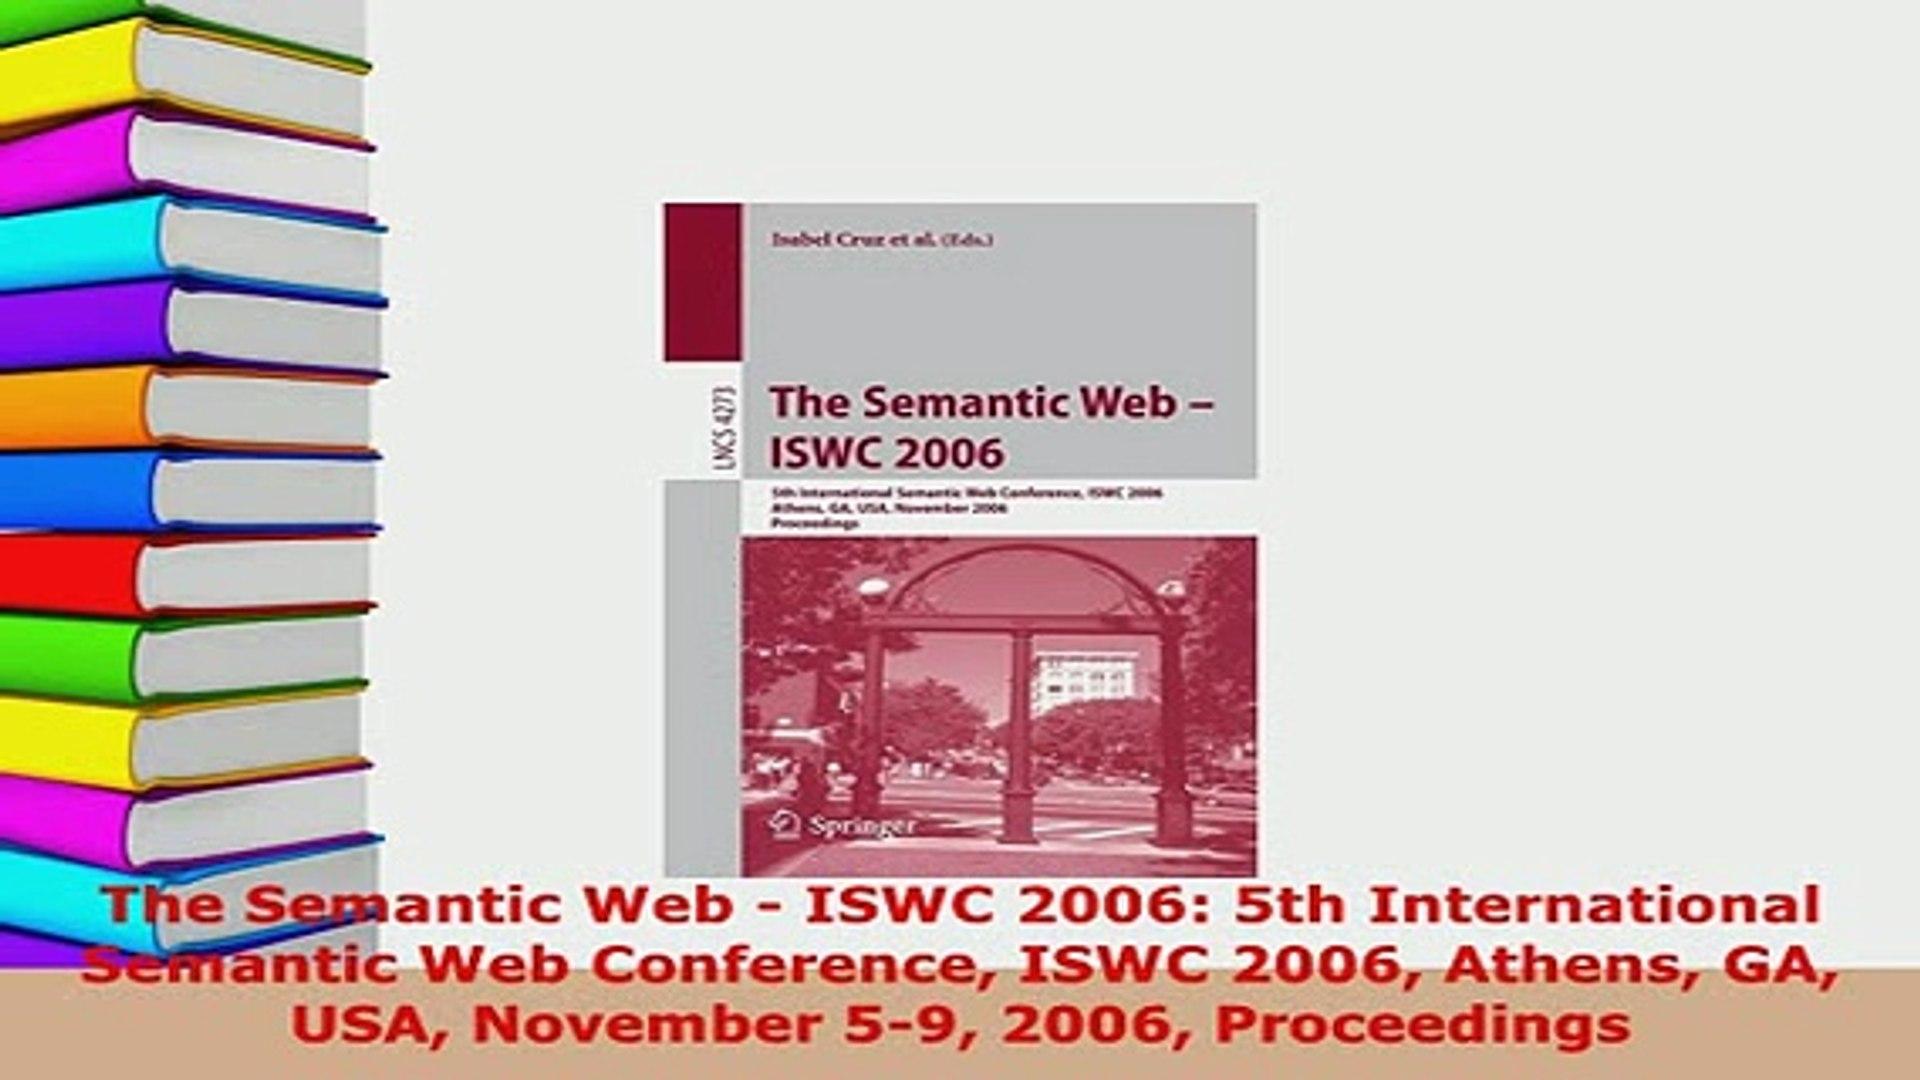 PDF  The Semantic Web  ISWC 2006 5th International Semantic Web Conference ISWC 2006 Athens  EBook